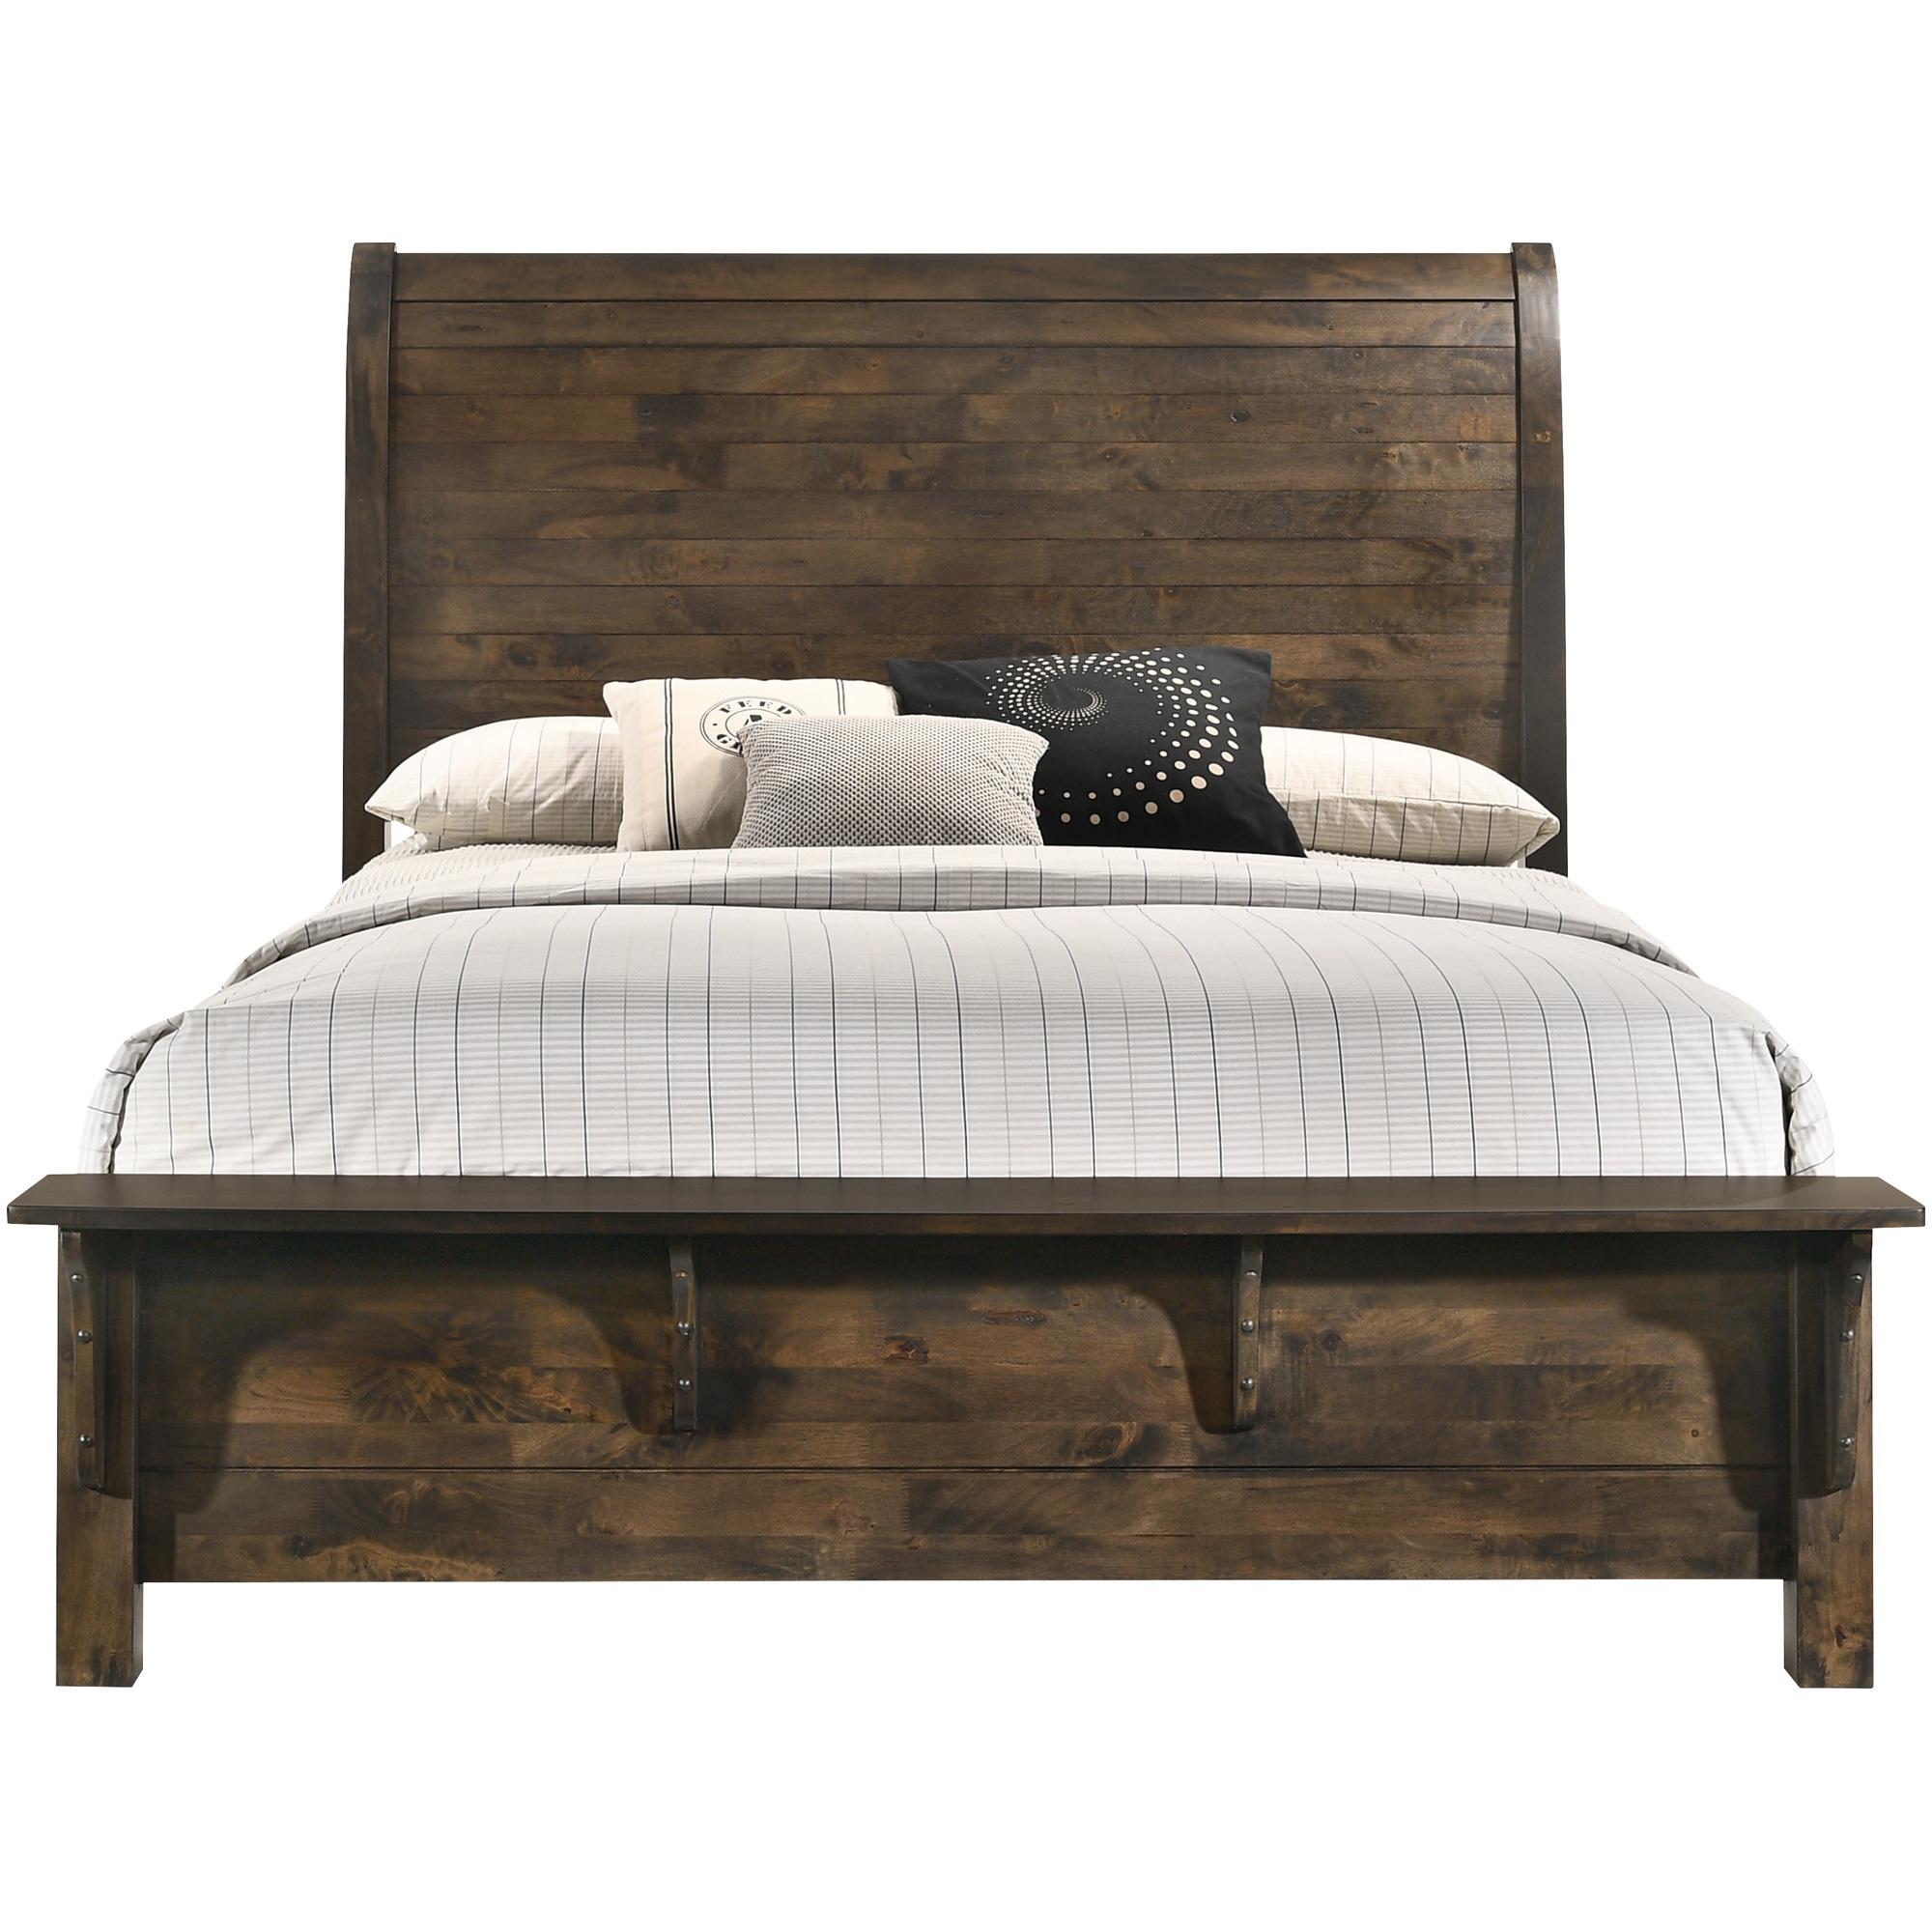 New Classic | Blue Ridge Rustic Gray California King Bed